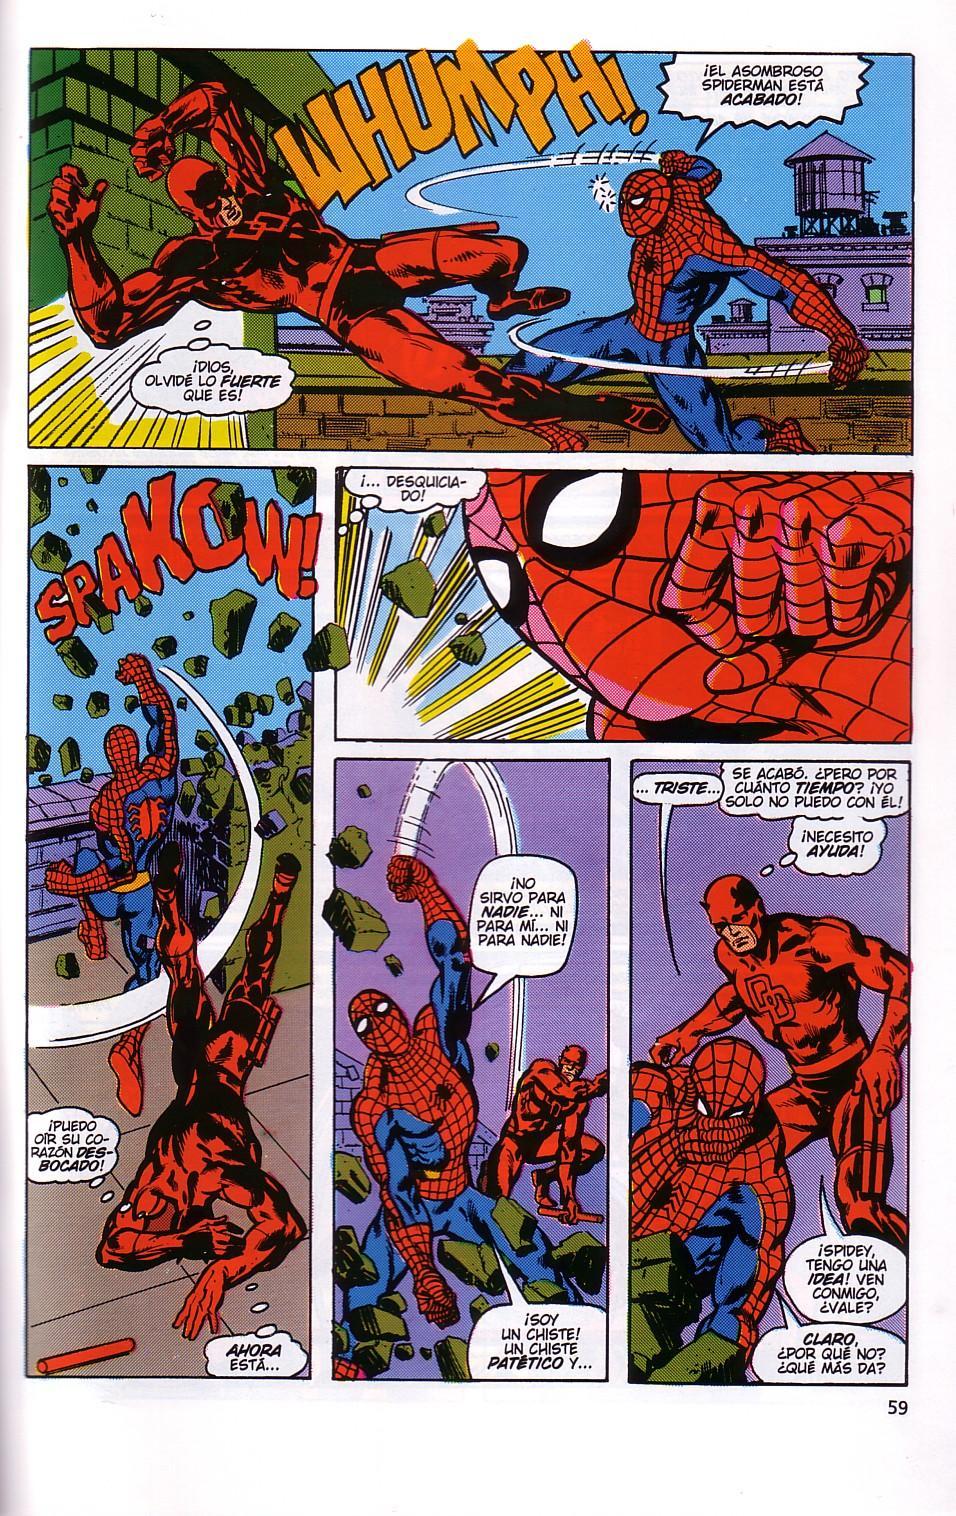 historieta de spiderman: